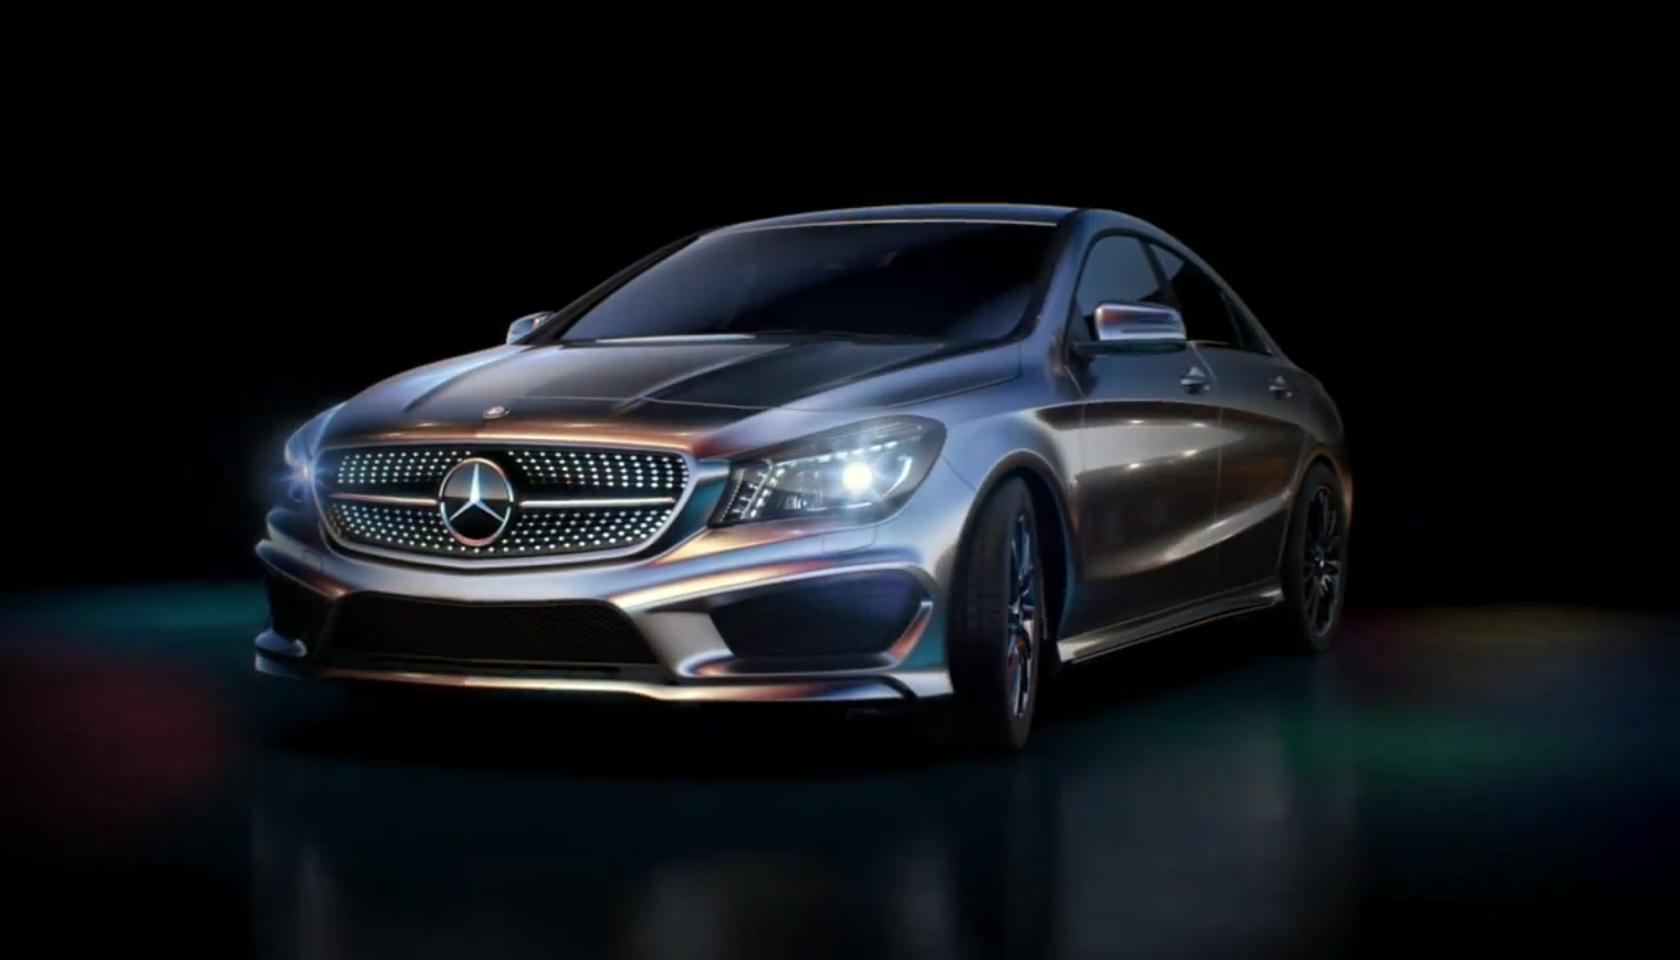 Mercedes benz cla gets alien launch commercial in japan for Mercedes benz commercials